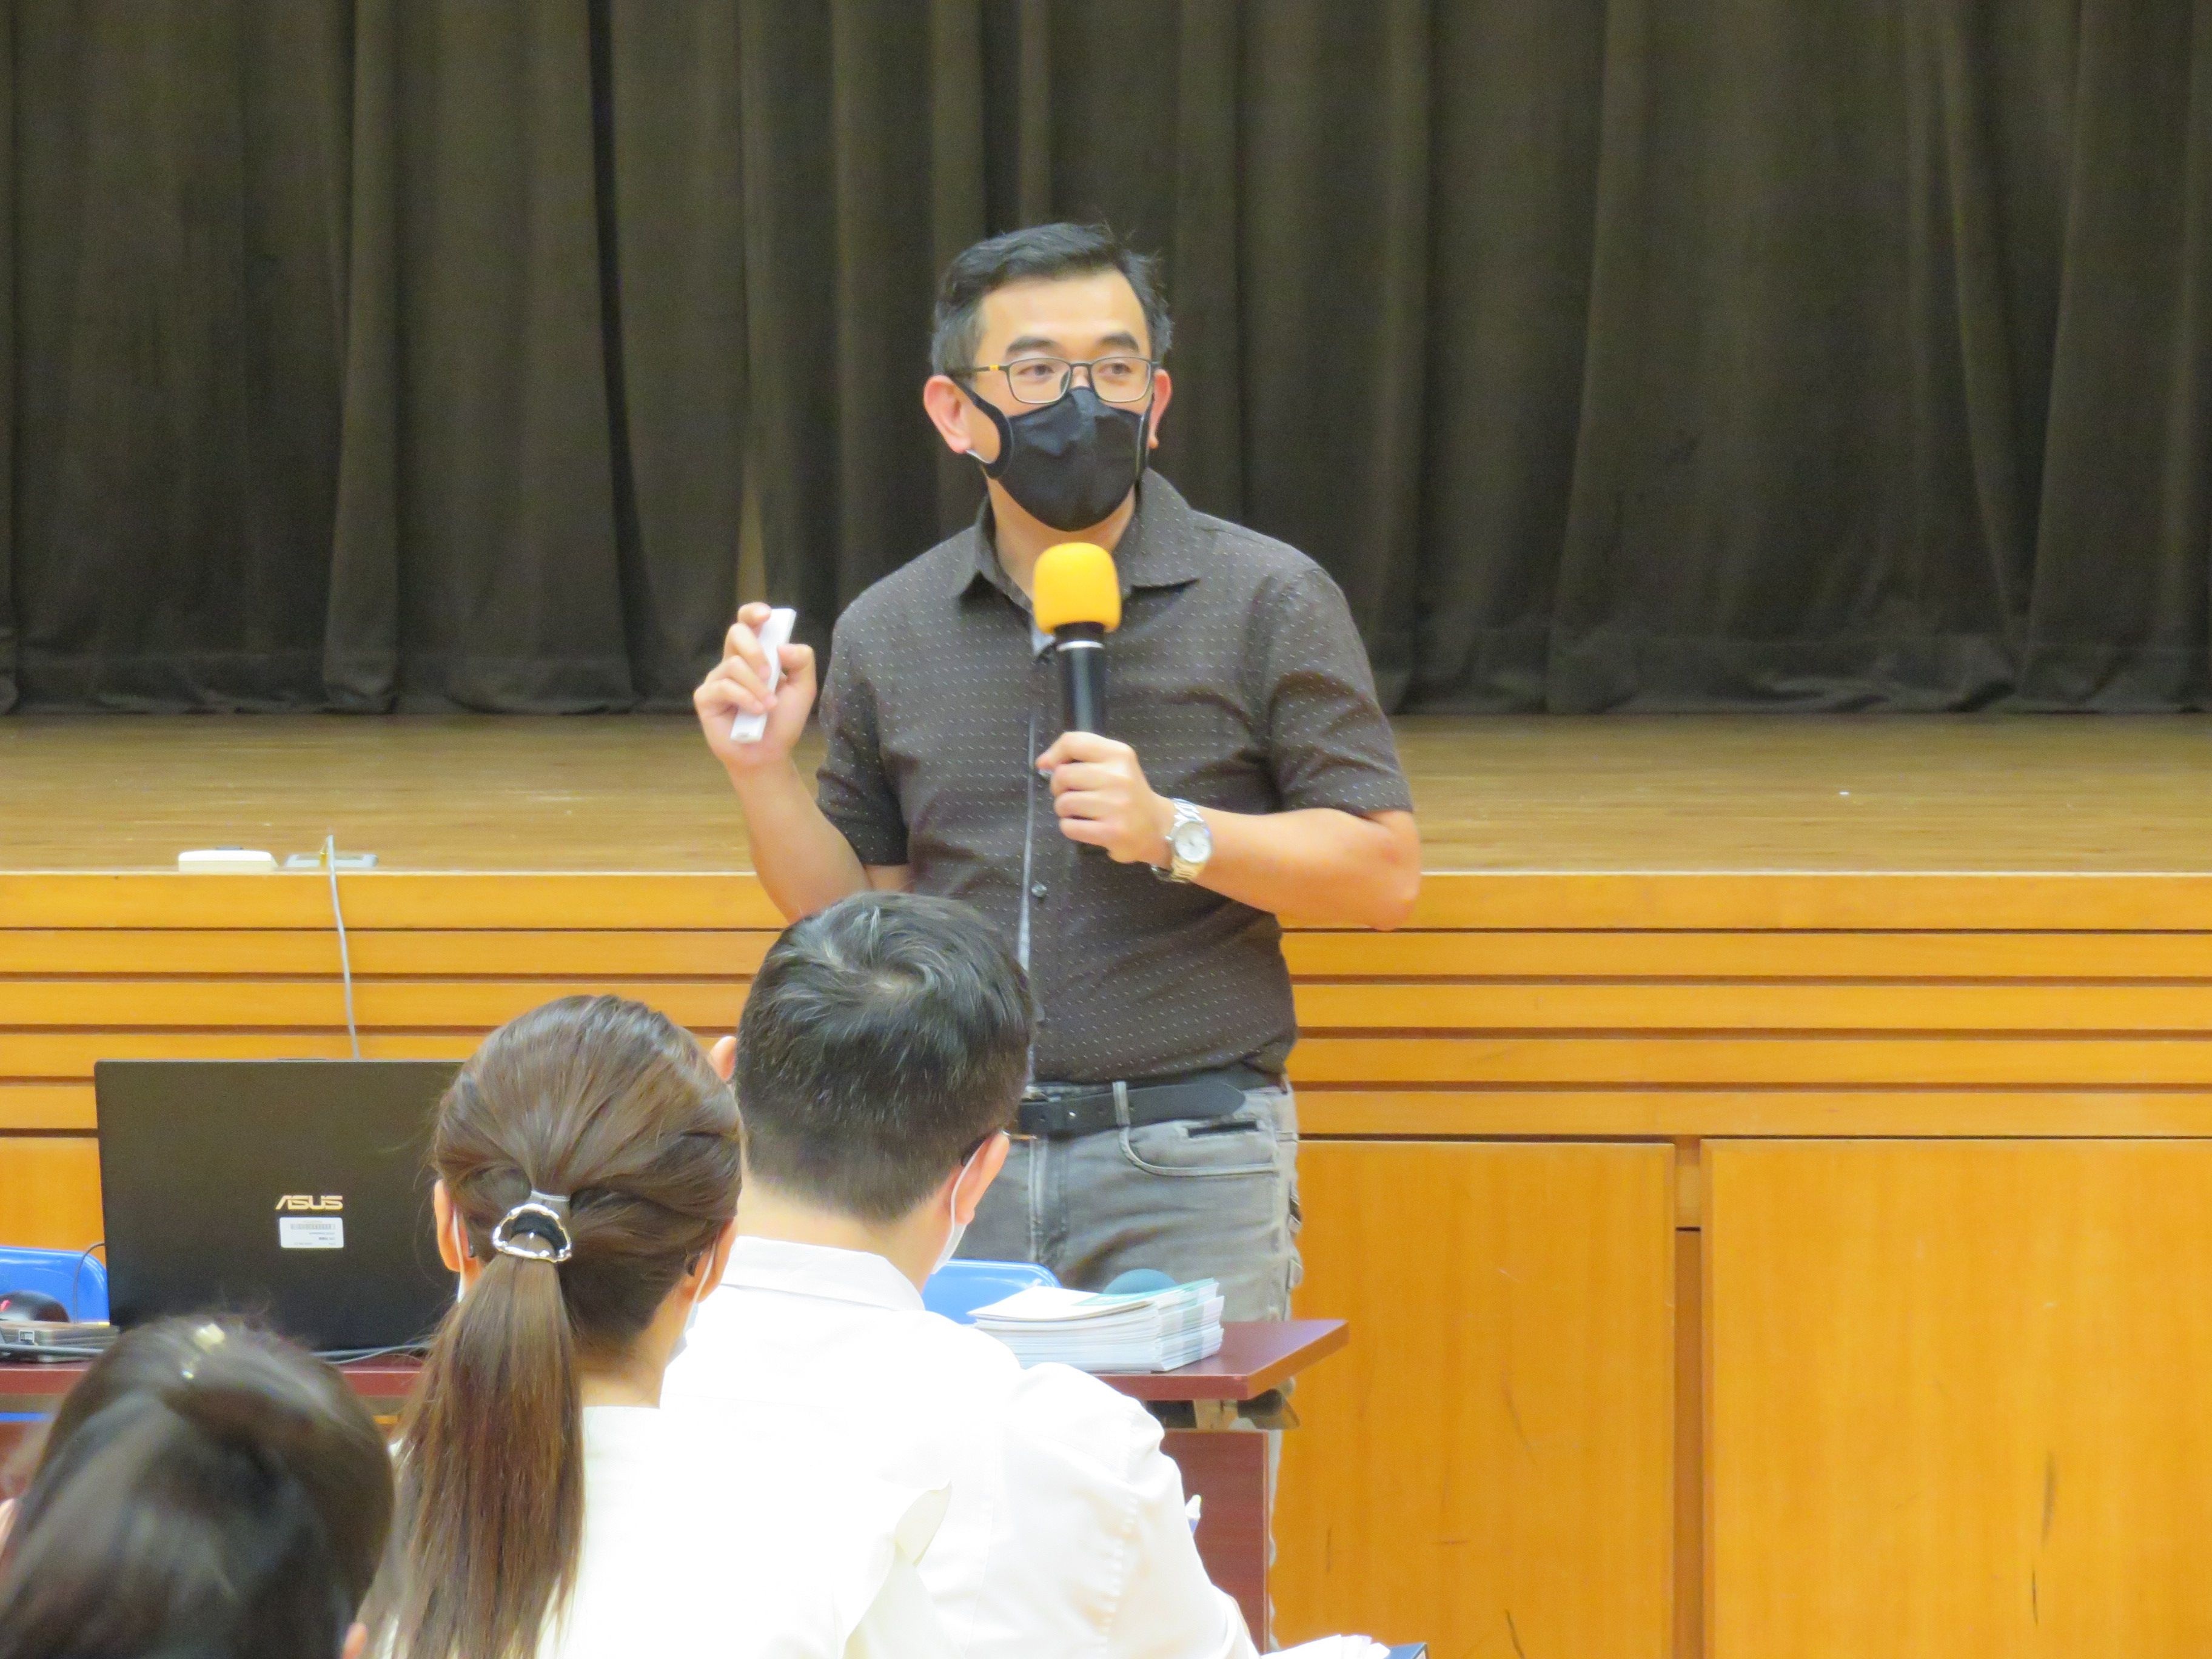 https://syh.edu.hk/sites/default/files/img_0470.jpg